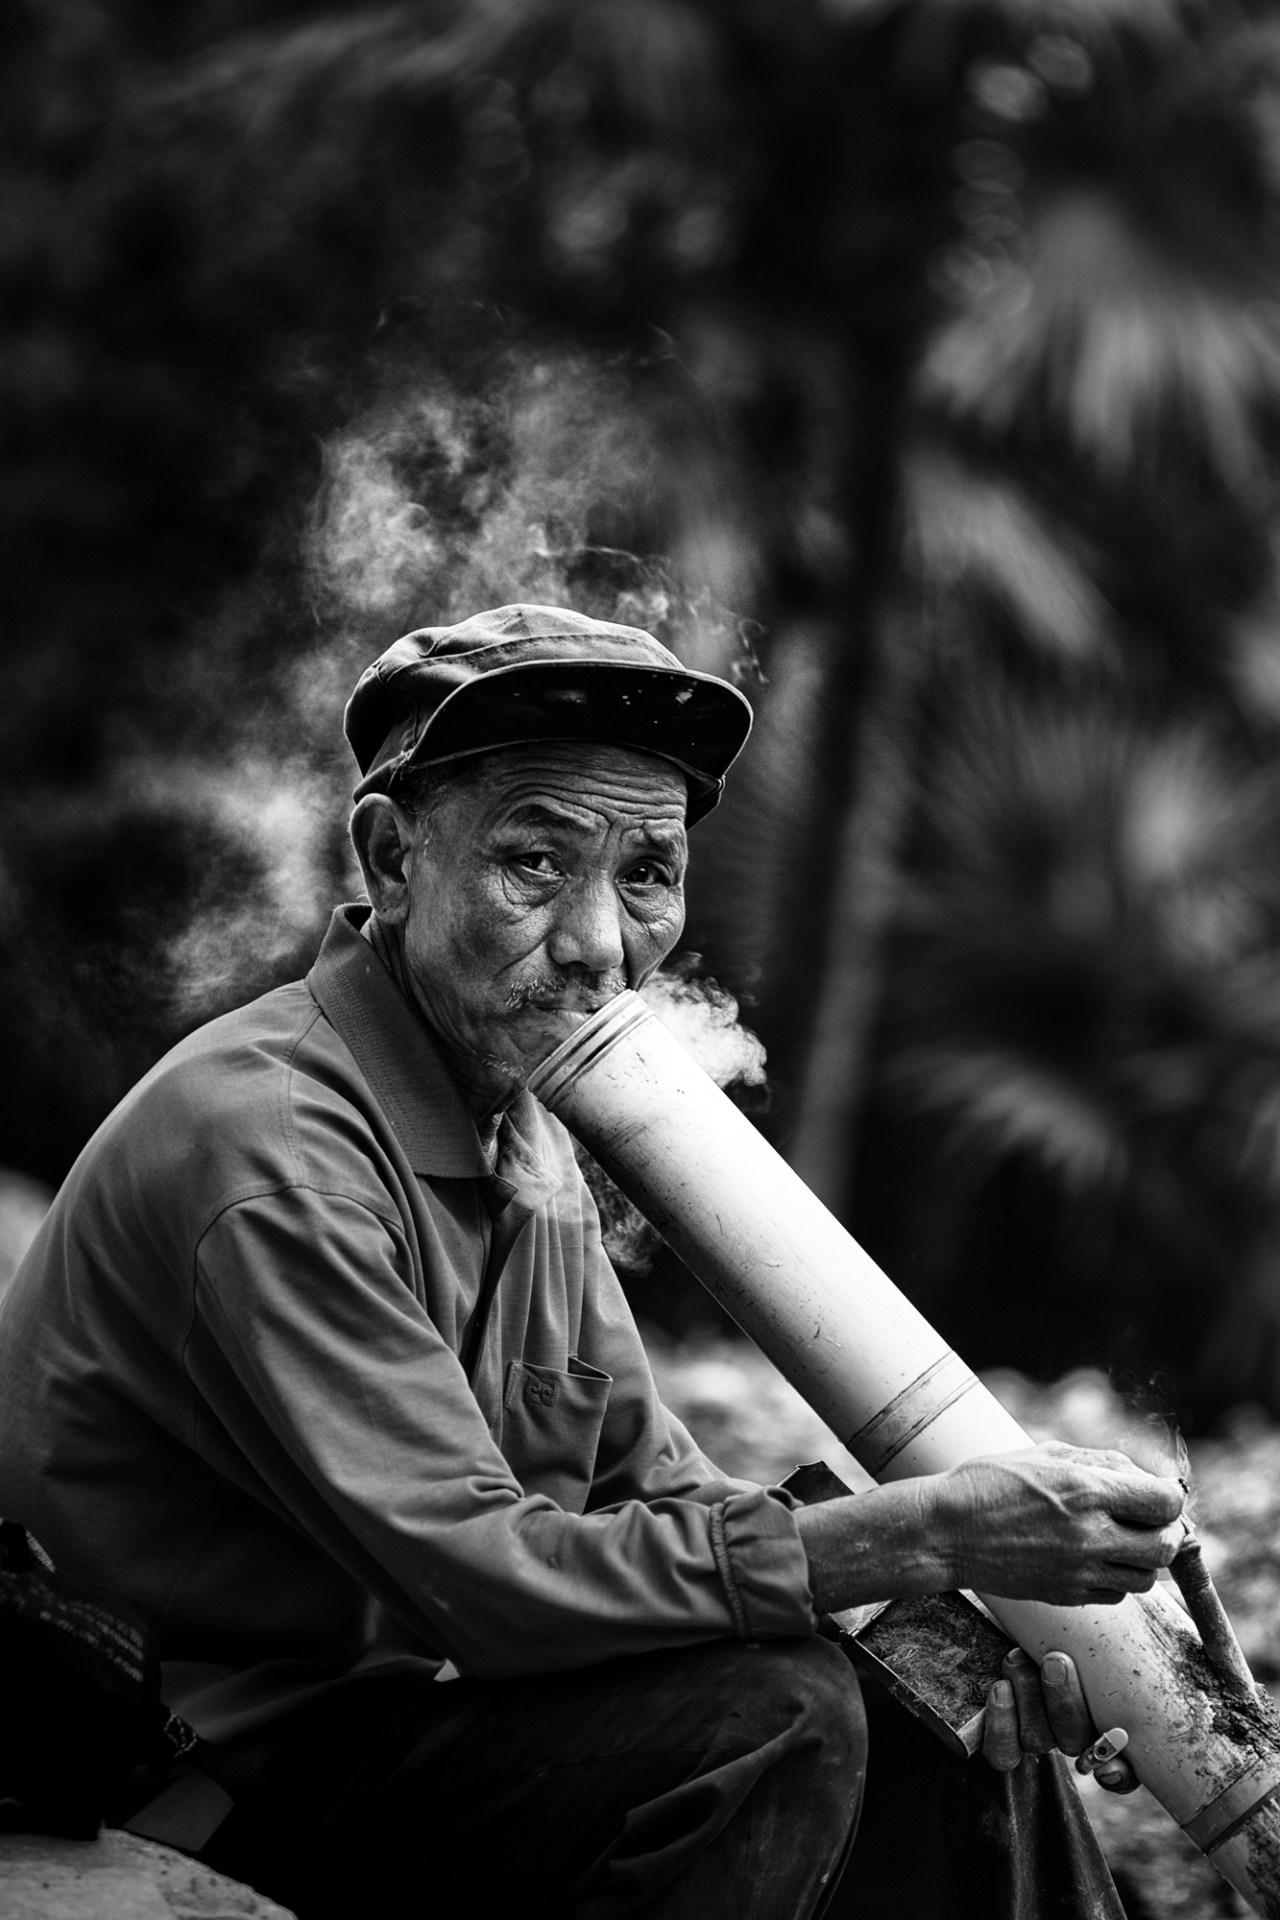 Yunnan's smoke culture